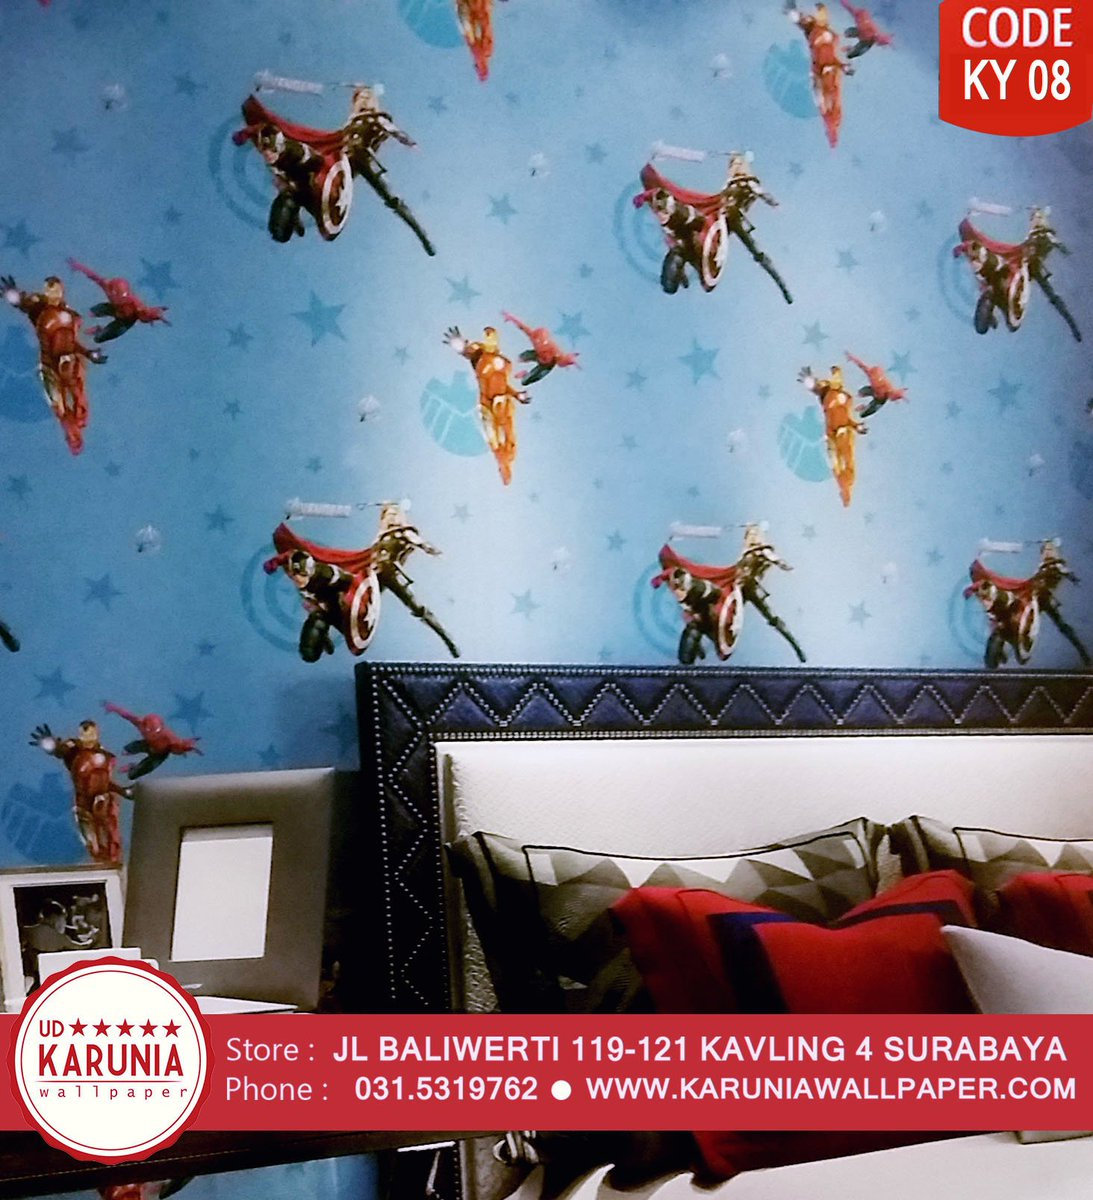 Karuniawallpaper Udkarunia Twitter